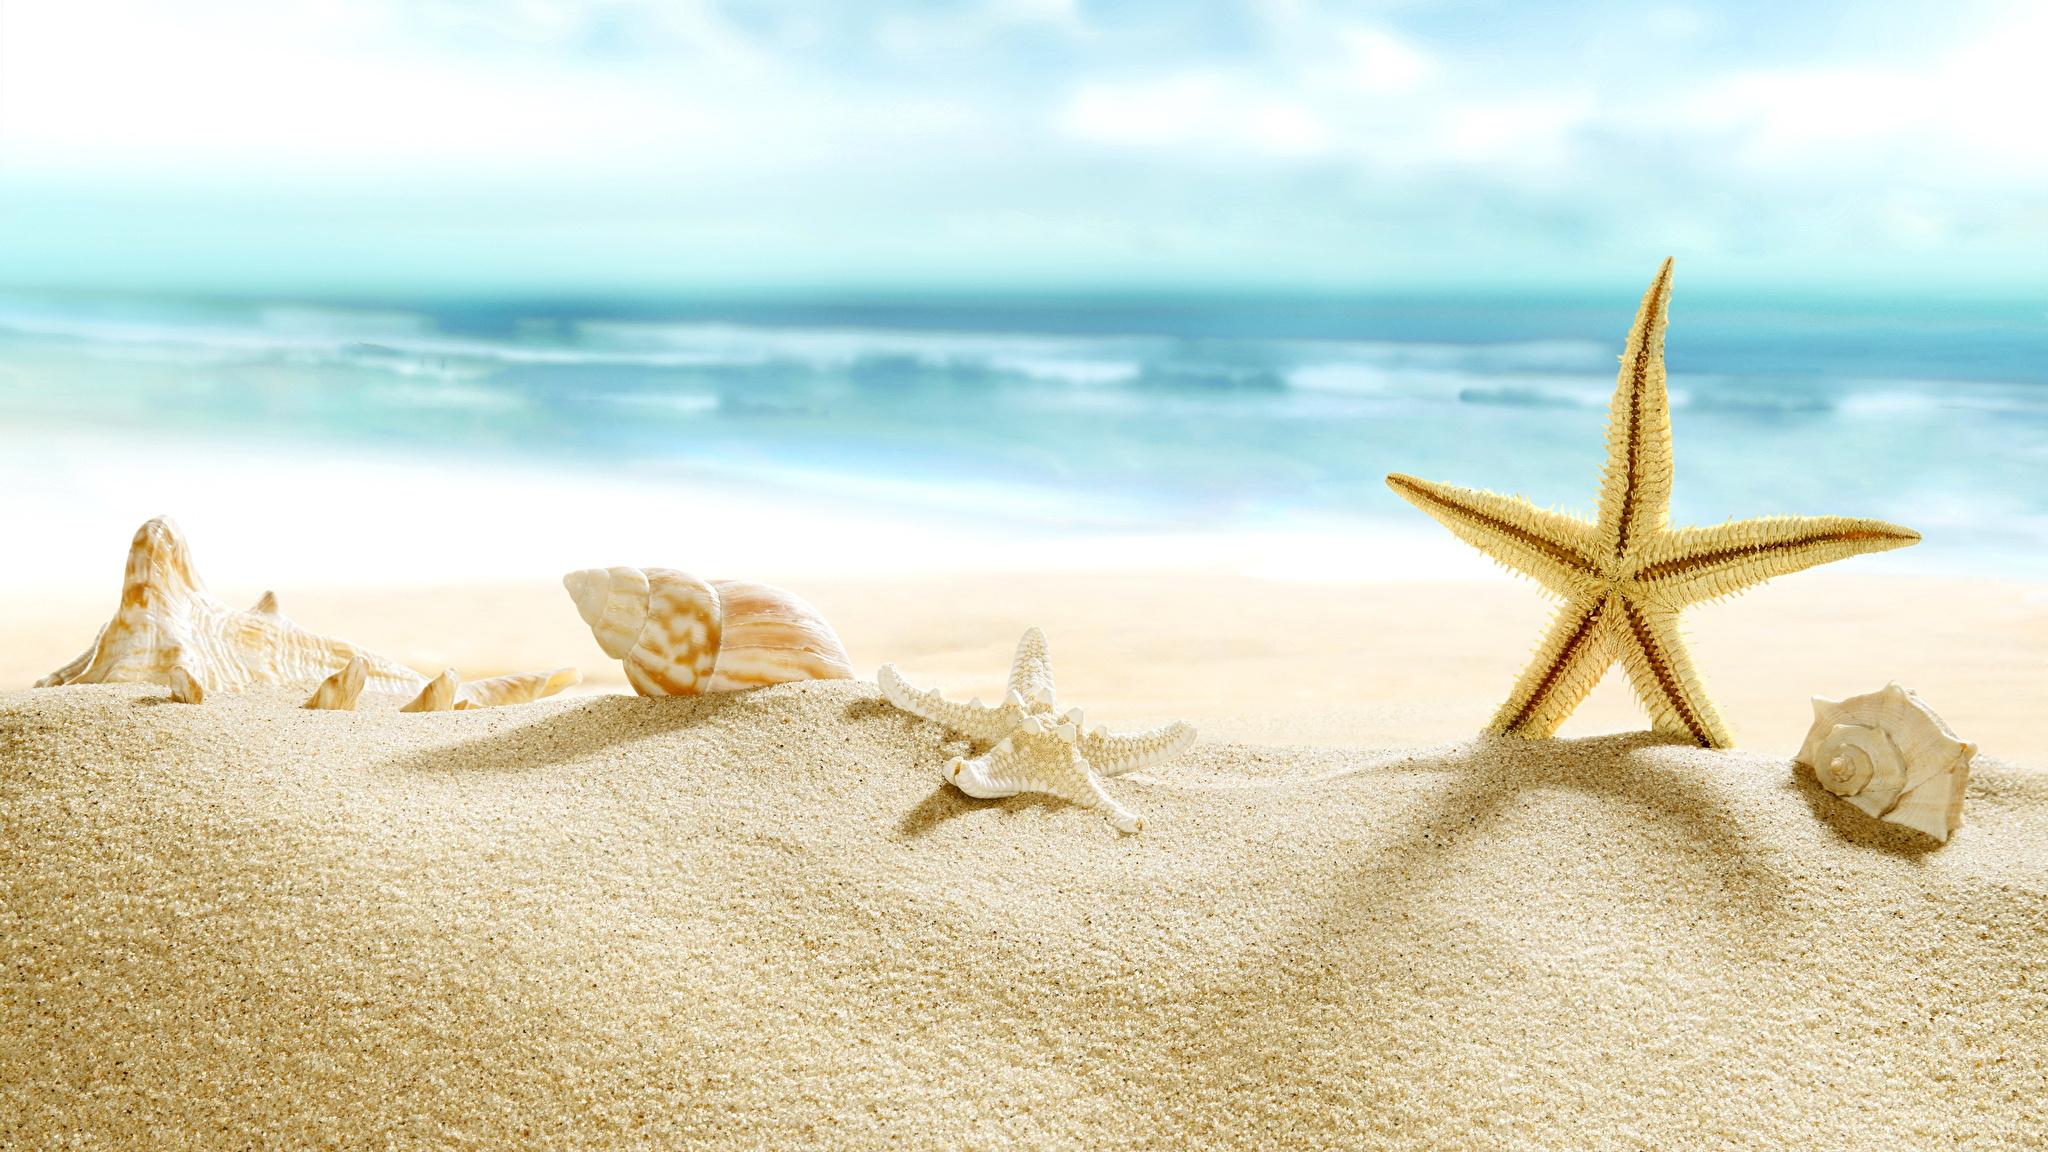 природа ракушка песок nature shell sand без смс